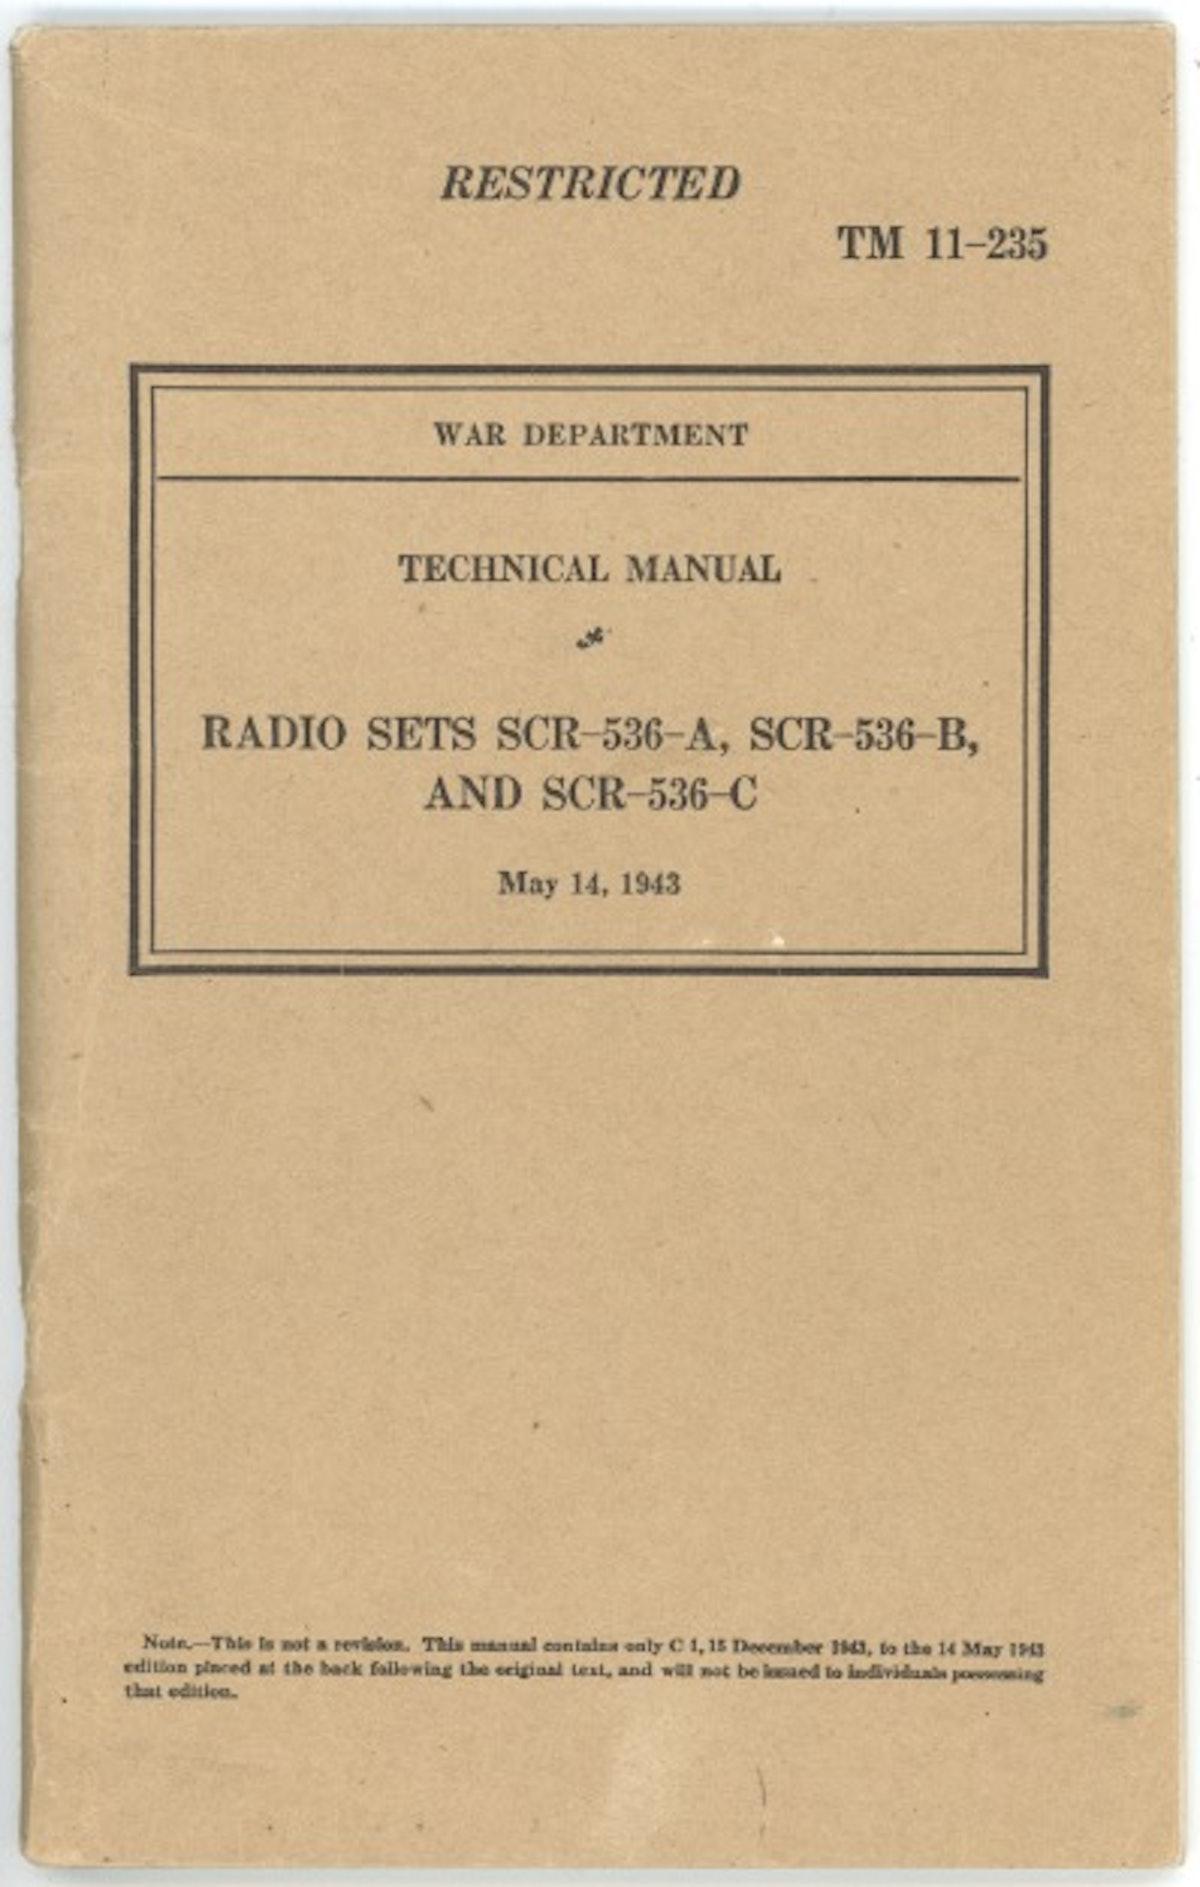 Technical Manual: Radio Sets SCR-536 A, SCR-536-B, And SCR-536-C